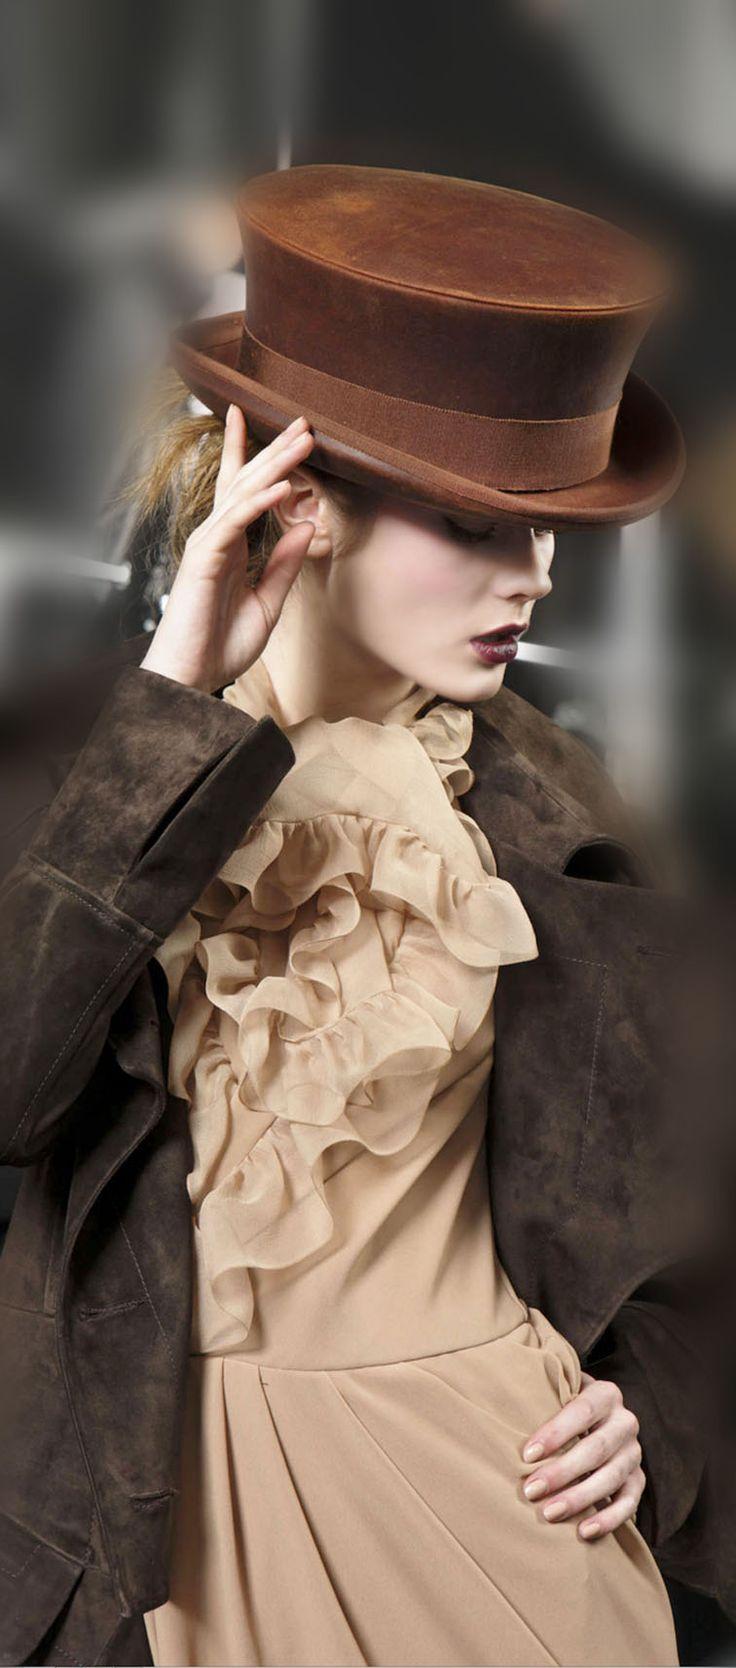 anbenna:   Christian Dior - She's A Lady